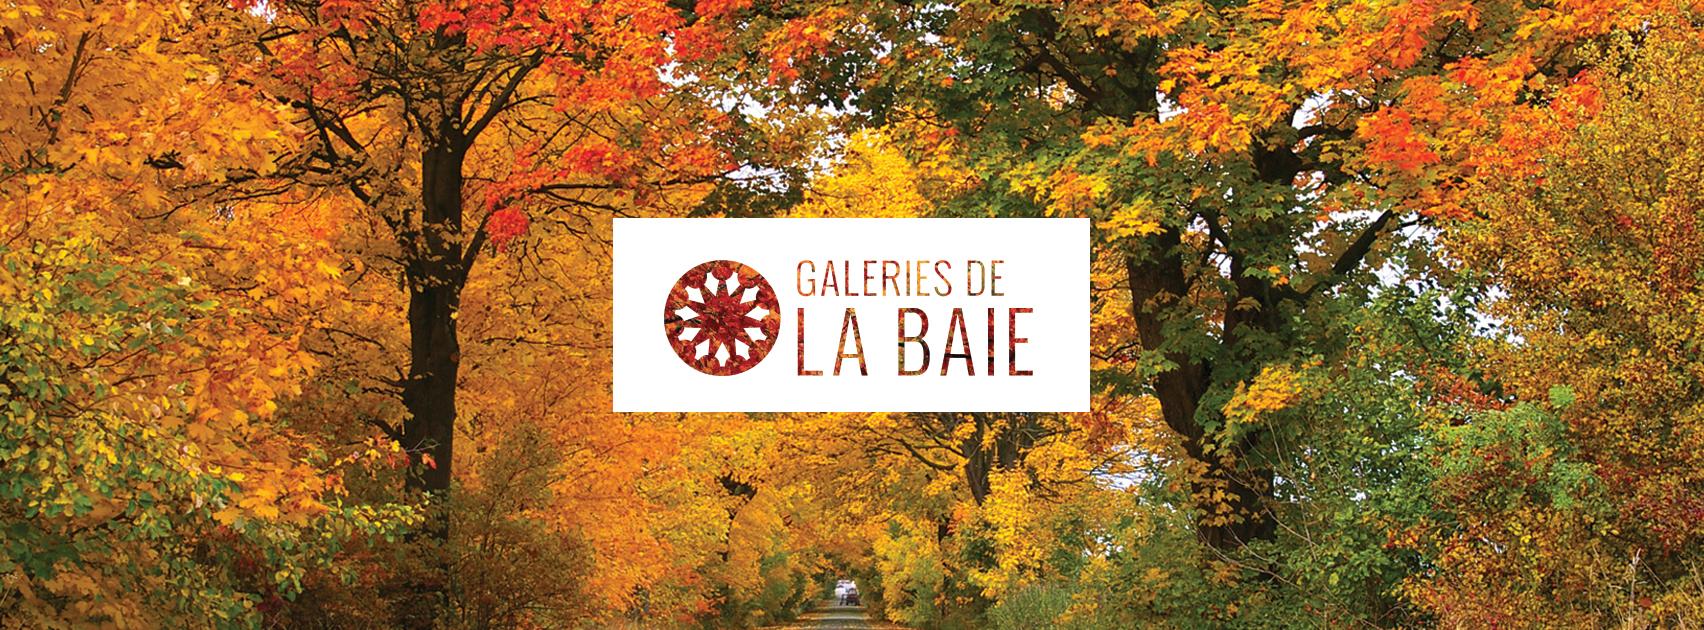 GaleriesLaBaie_bandeauFacebook_automne